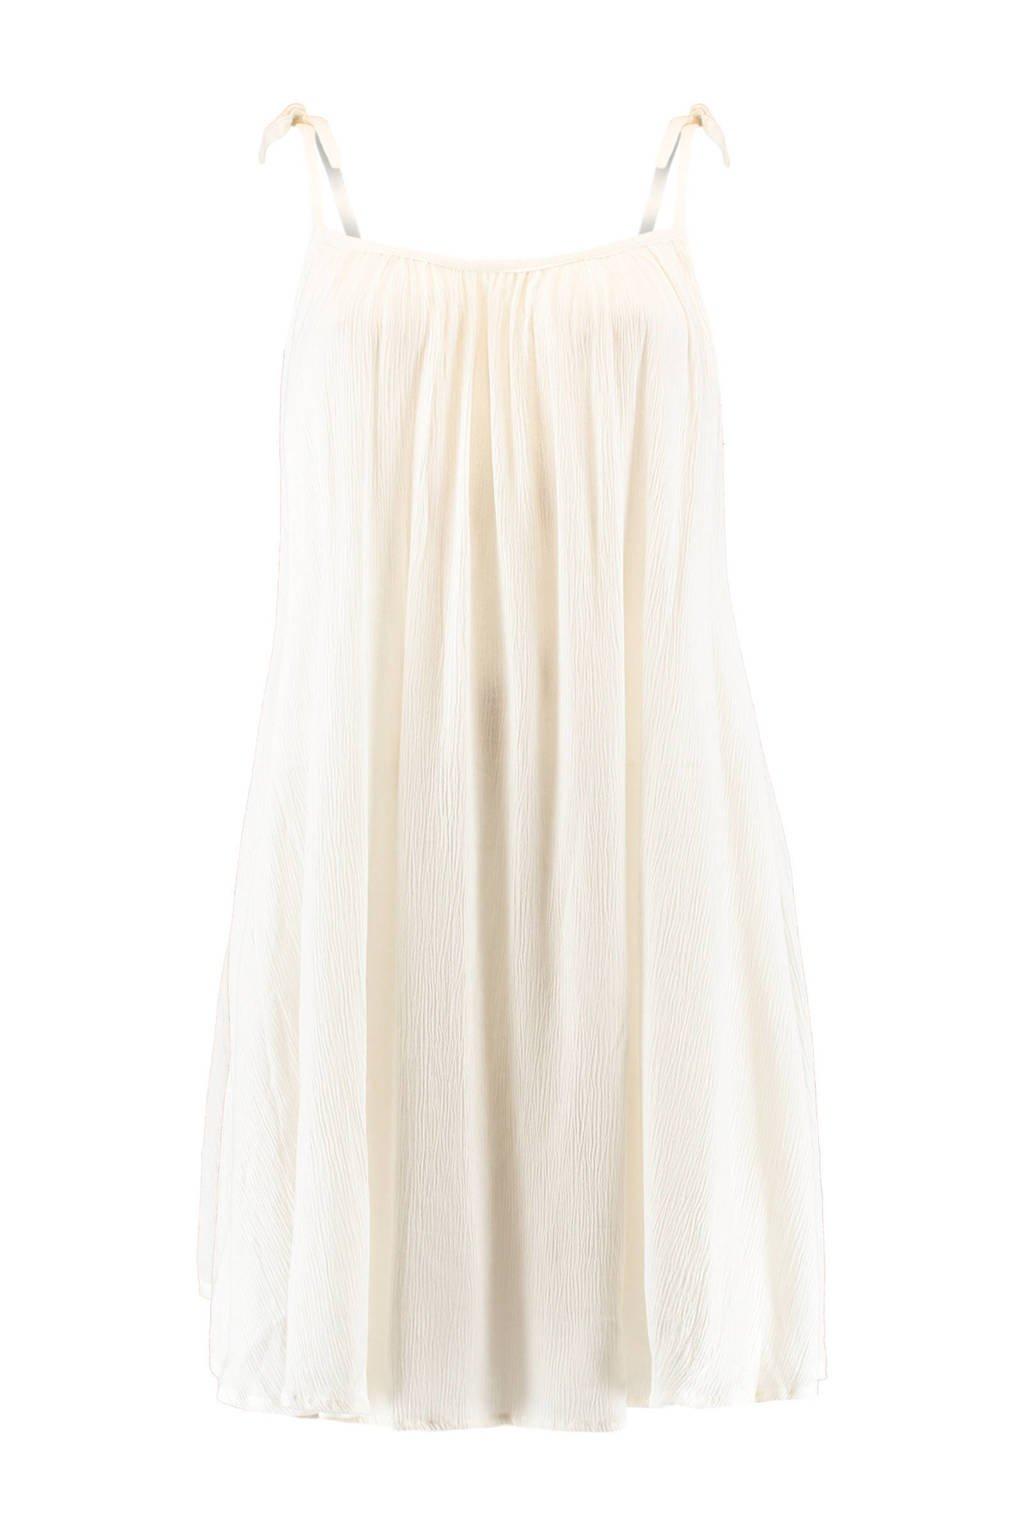 America Today jurk Myla off white, Off White